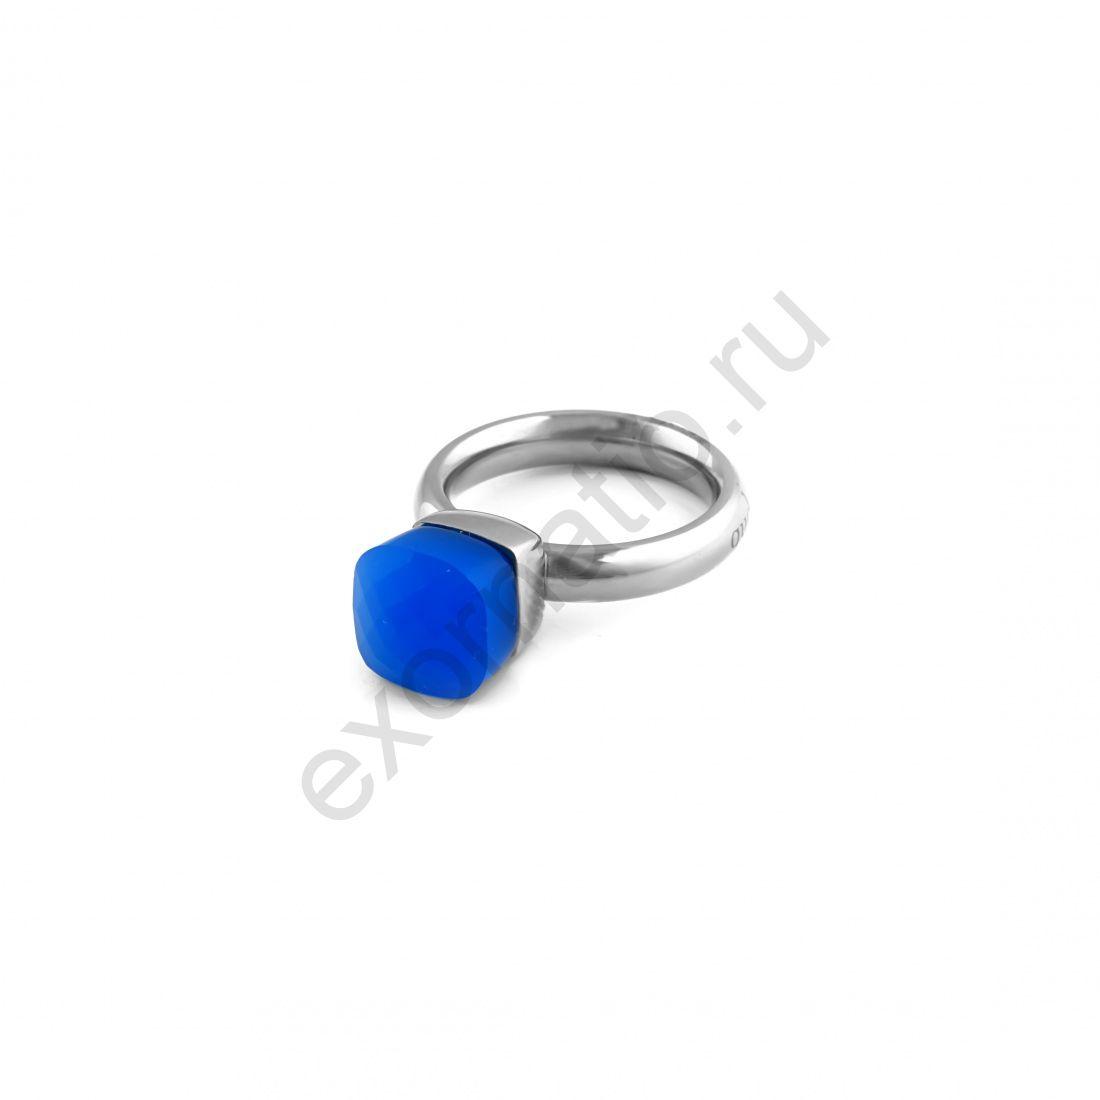 Кольцо Qudo 610537/17.2 BL/S